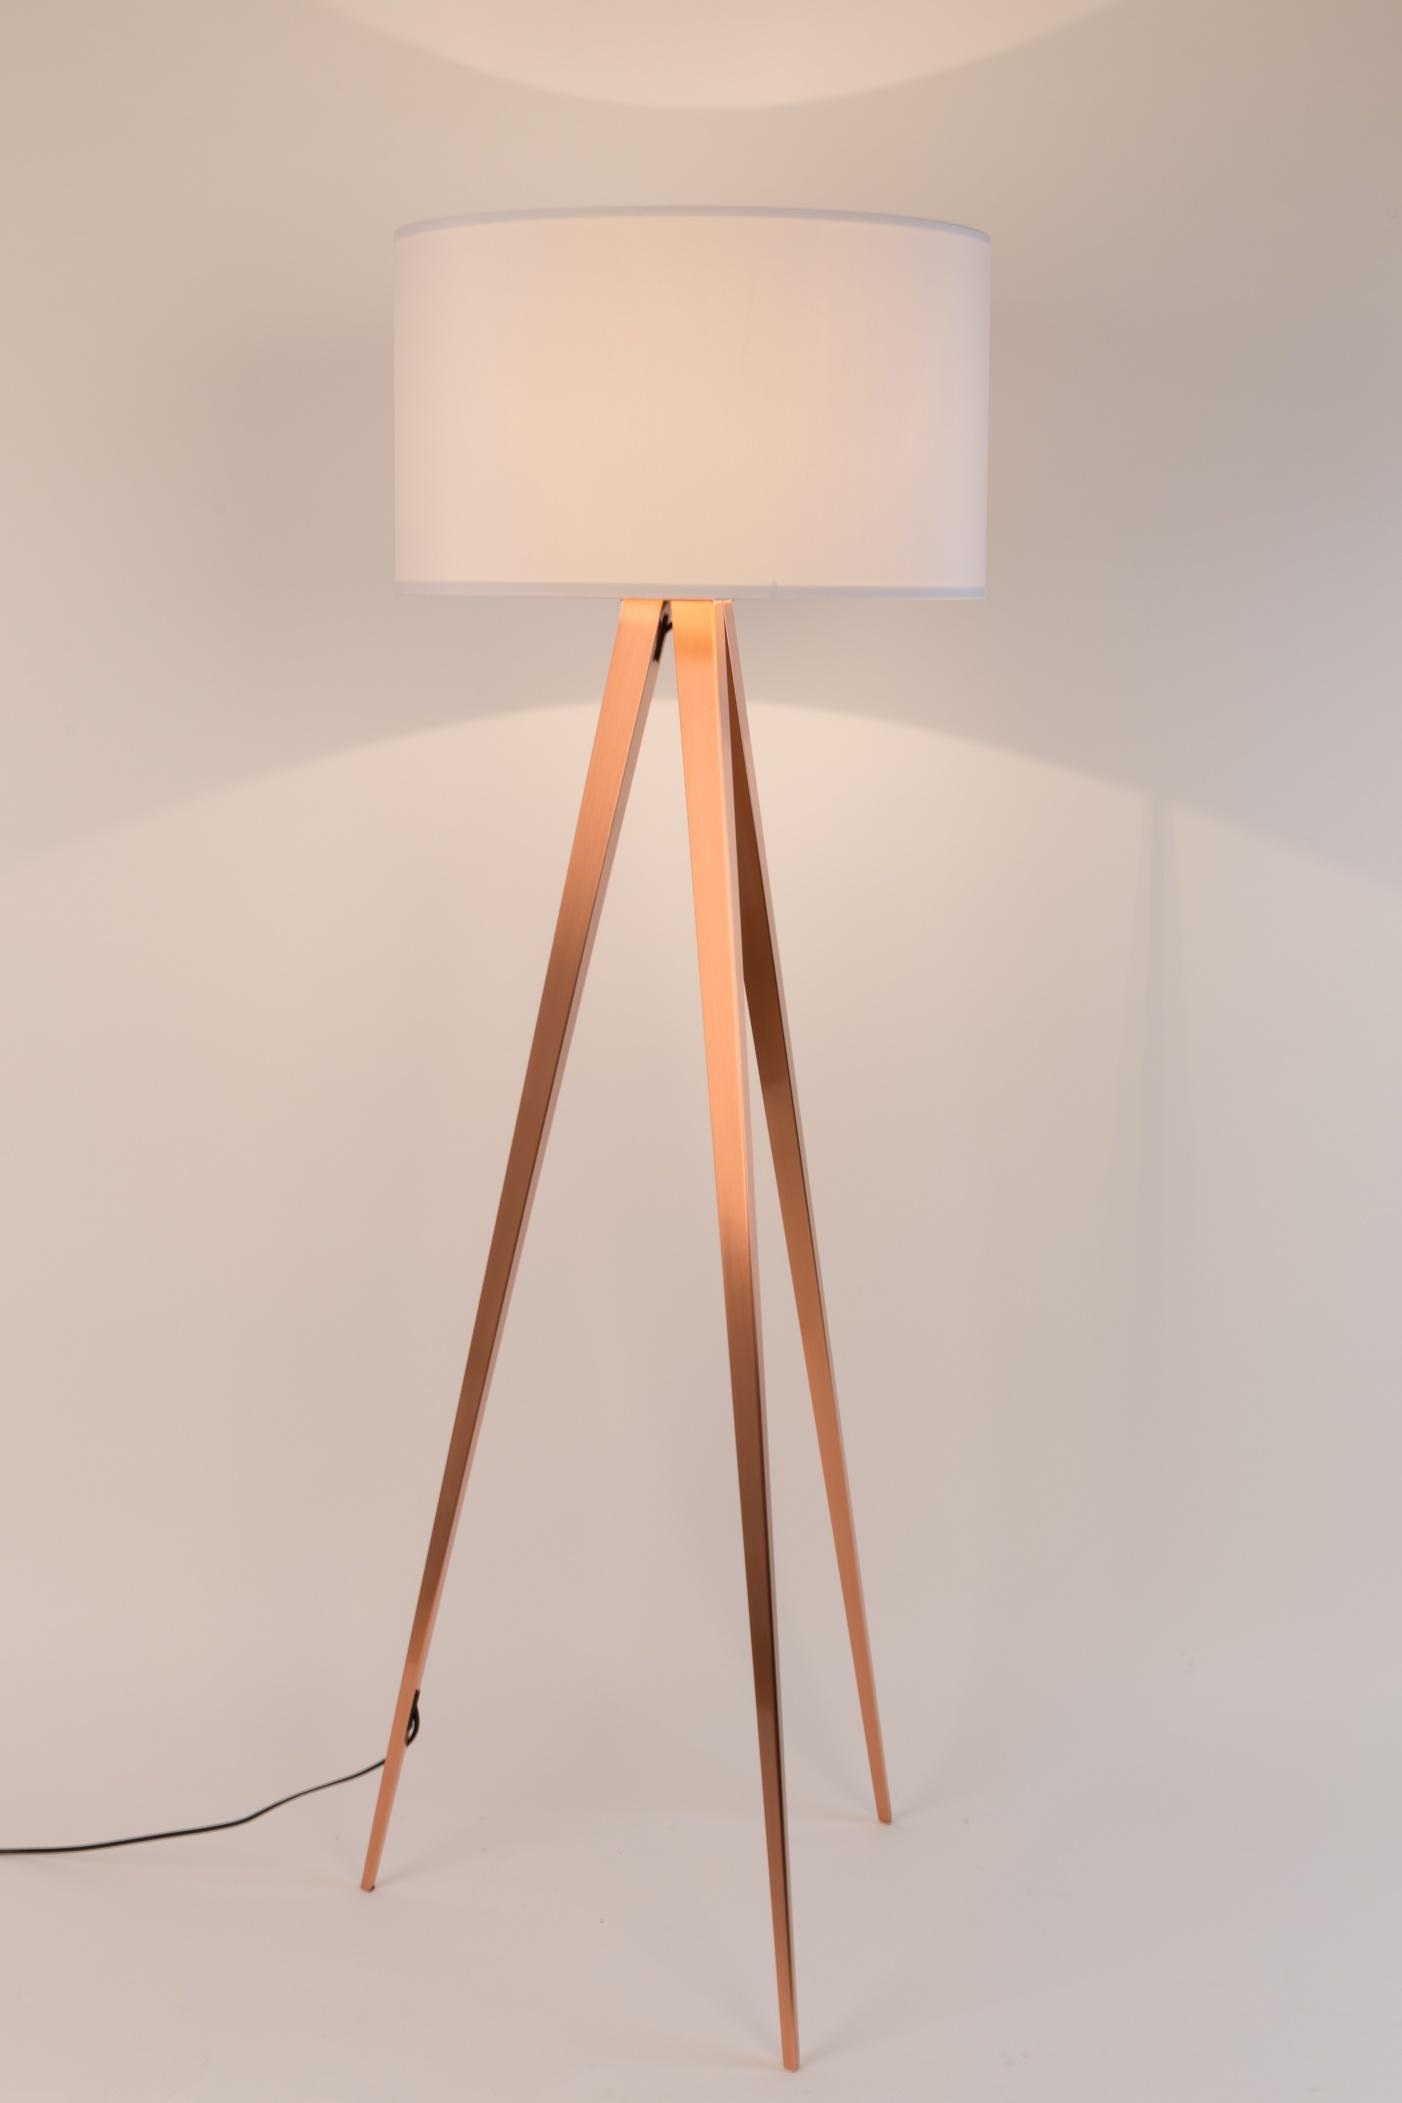 Zuiver Vloerlamp Tripod - H154 Cm - Koper - Witte Lampenkap